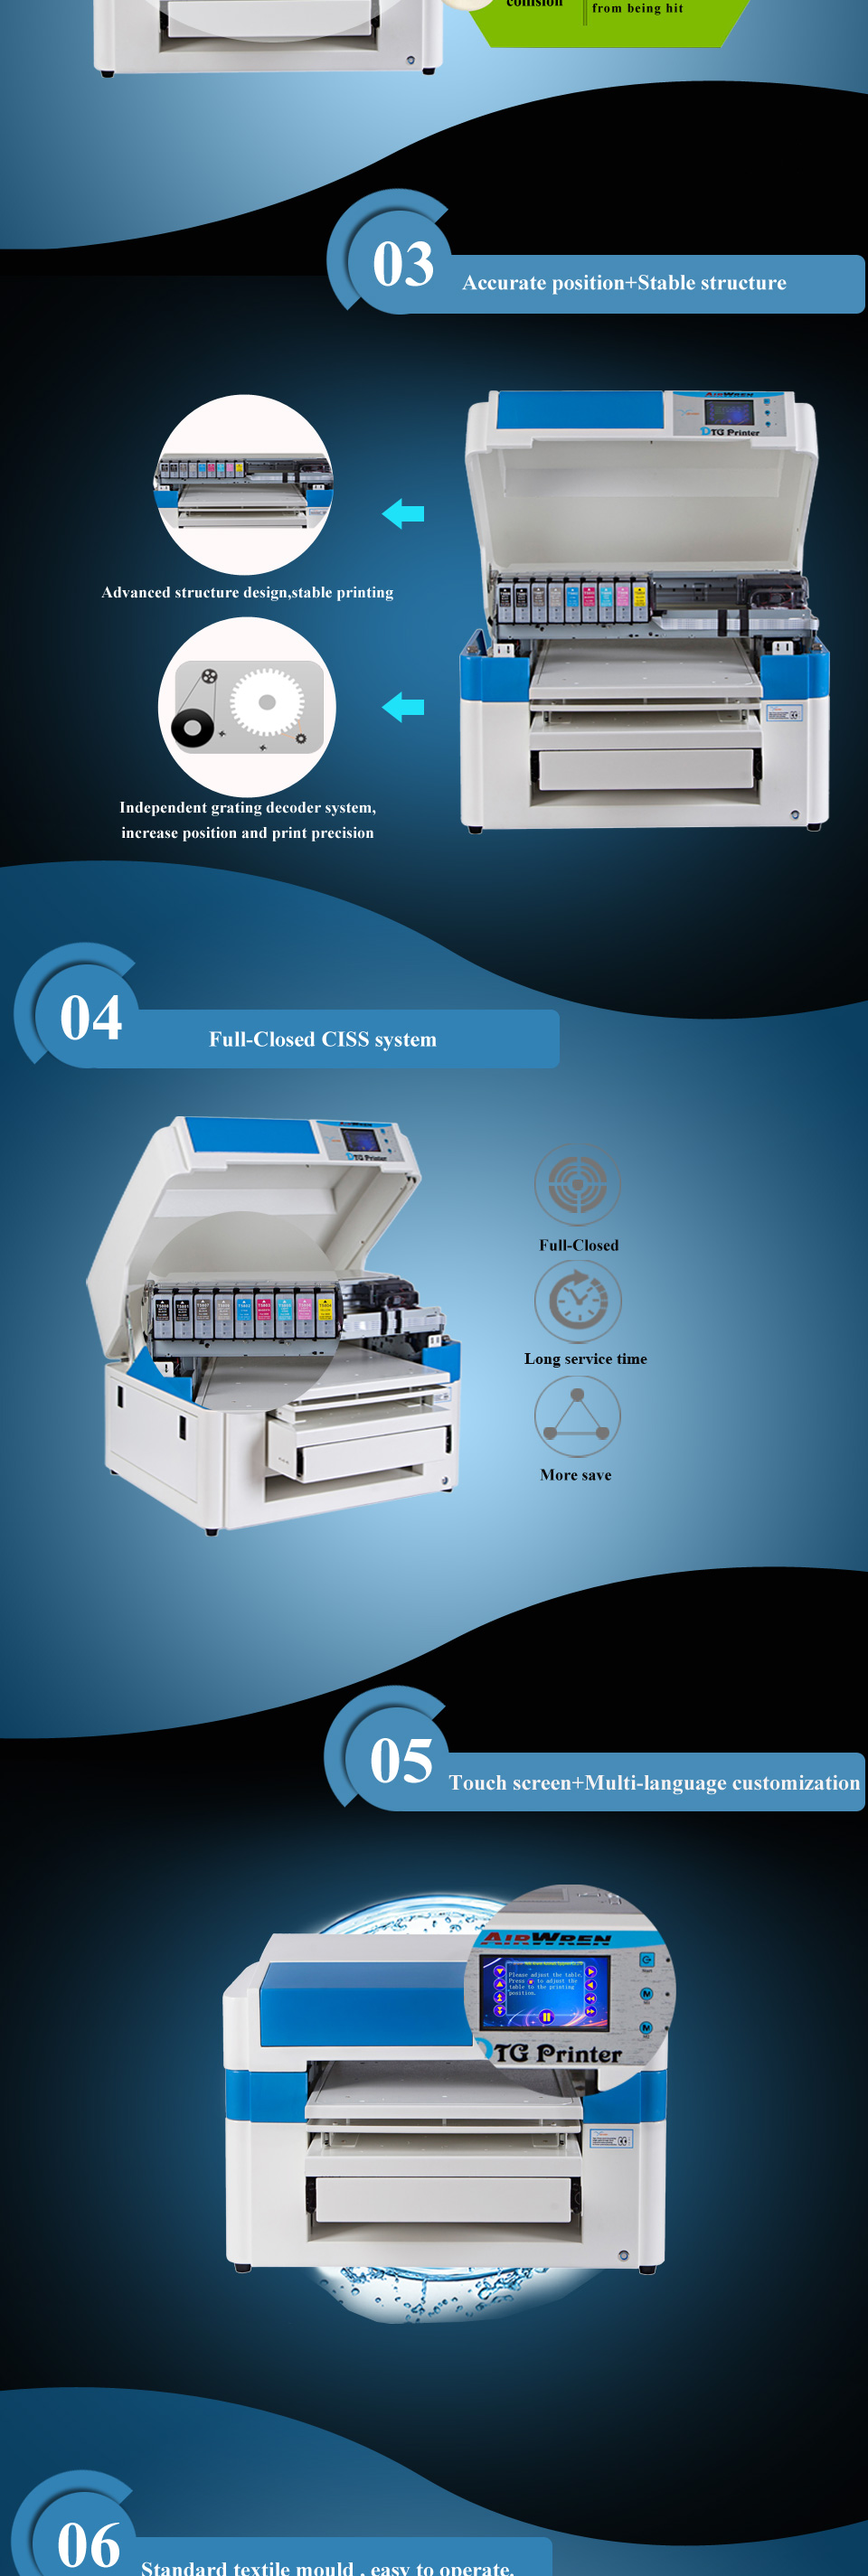 7554be7f8 a2 size digital printer dtg garment printer for sale. T600_01 T600_02  T600_03 T600_04. Advantage of textile printer